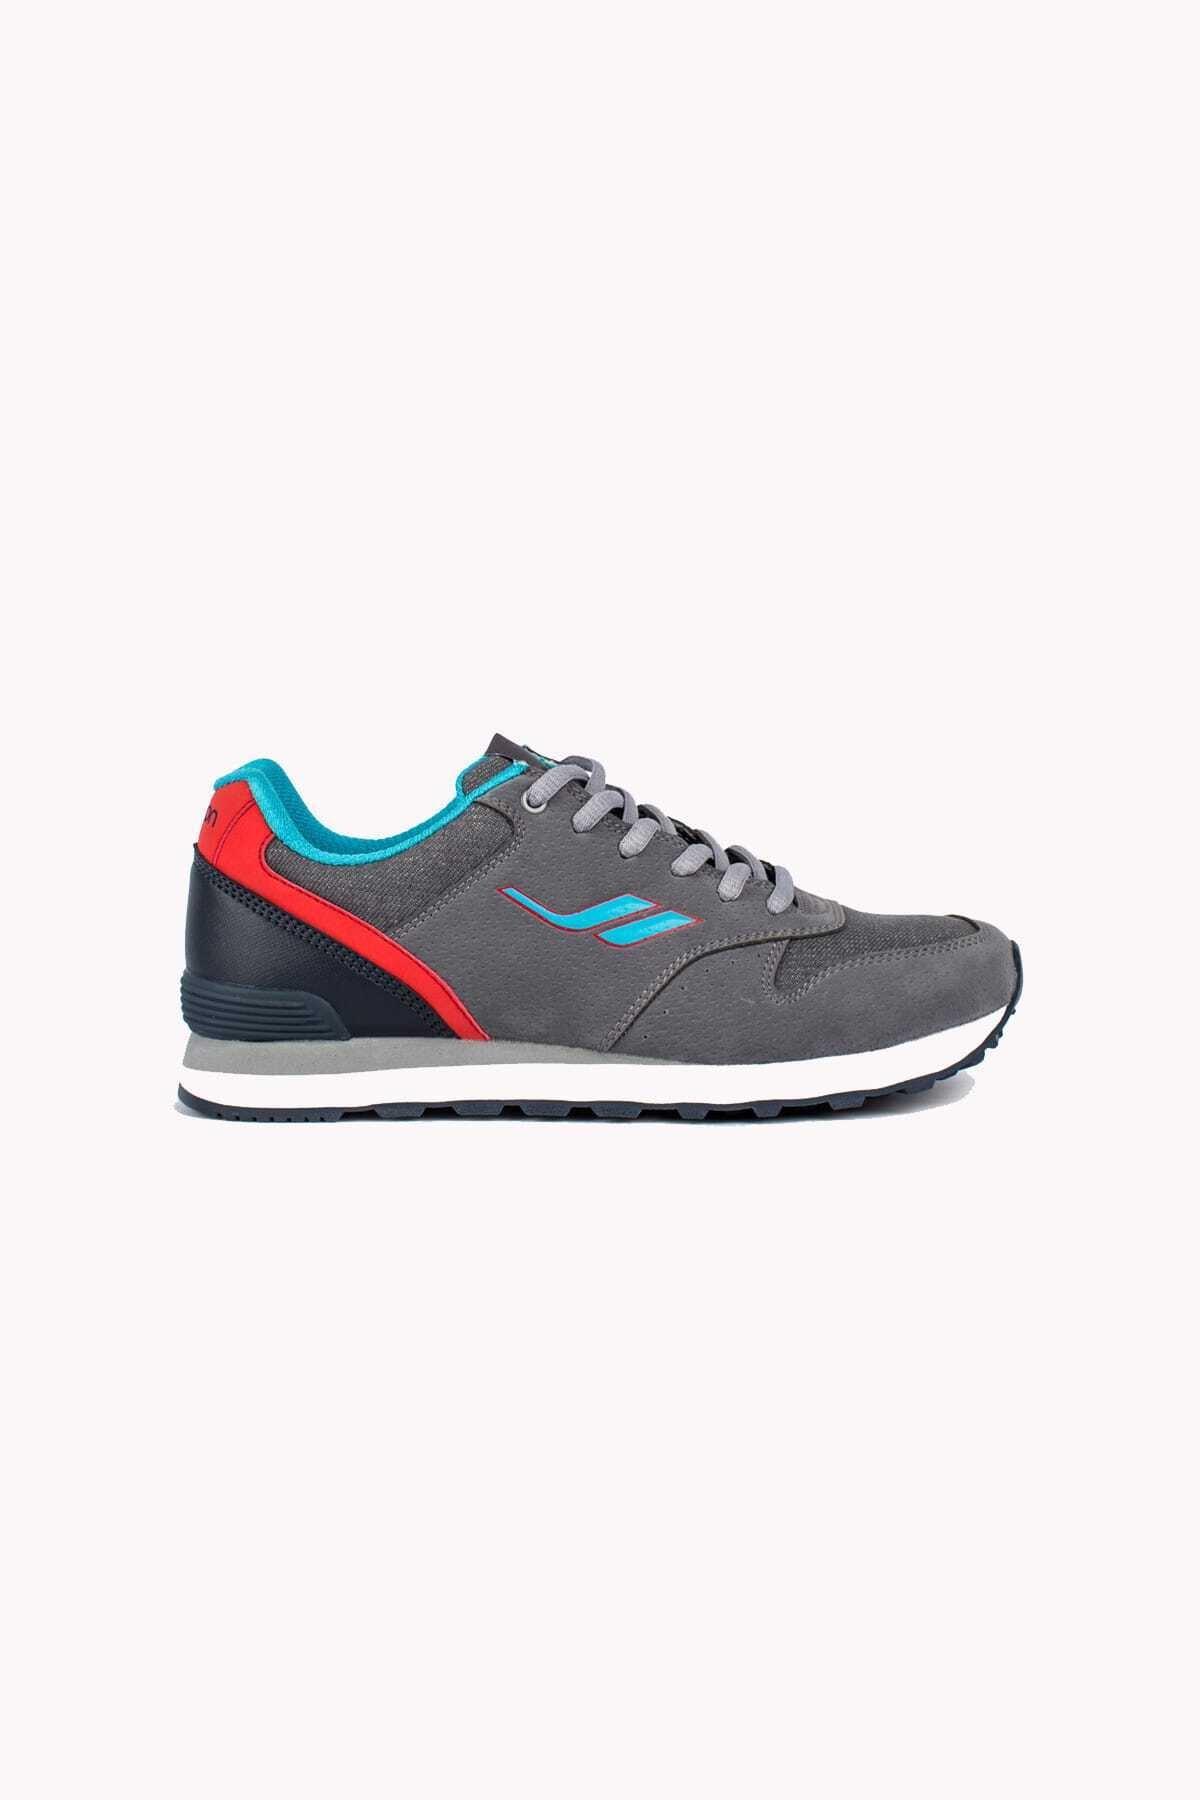 Lescon Kadın Sneaker L-5618 - 18bau005618g-afm Gri 1